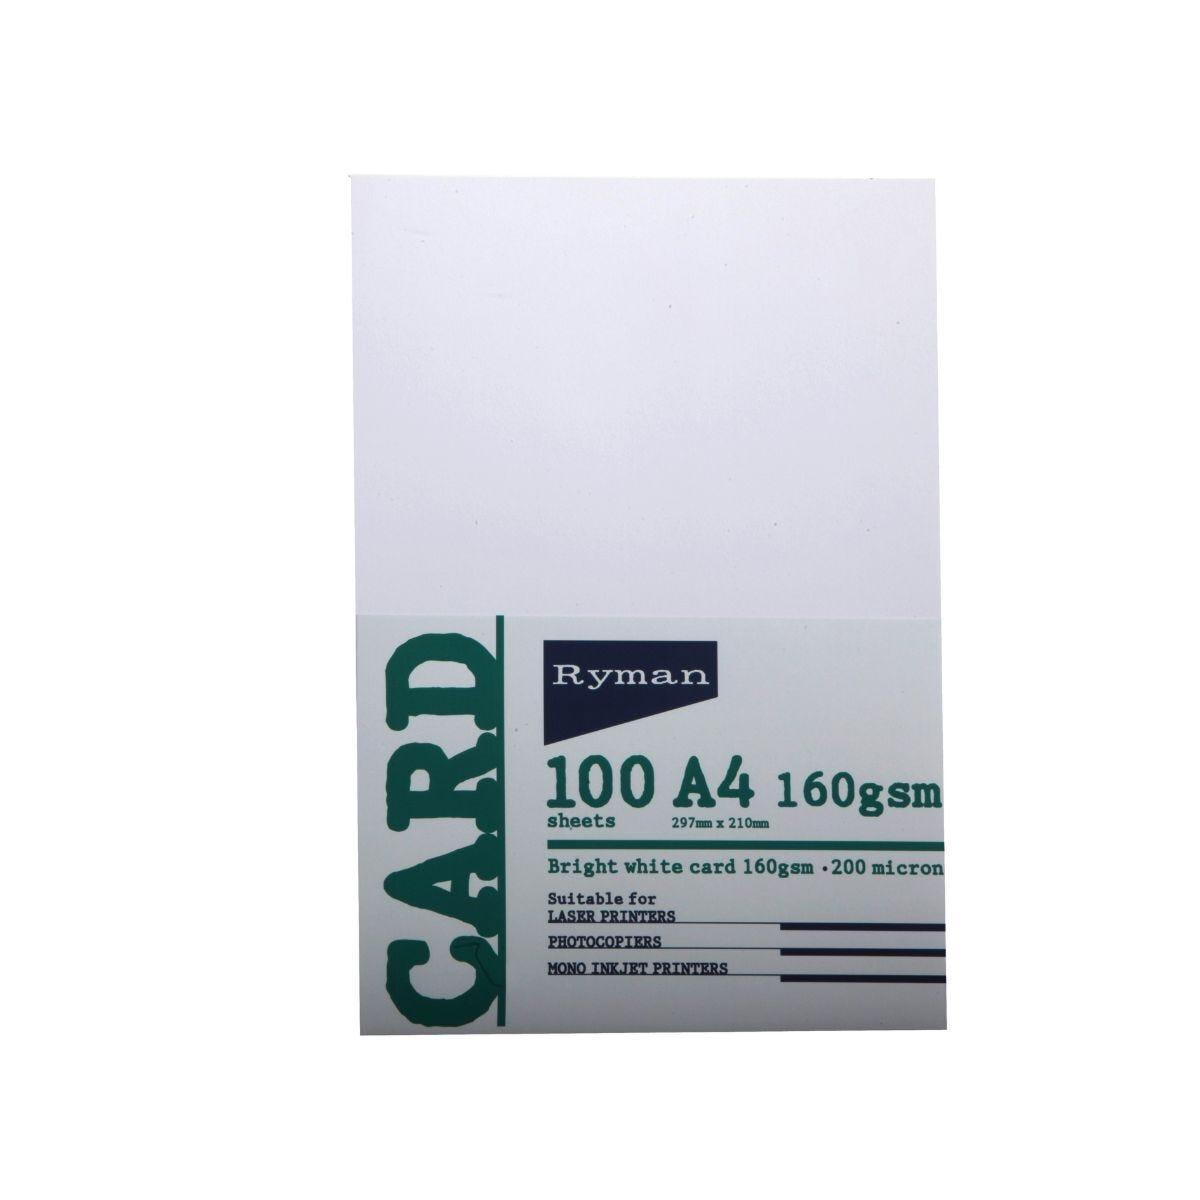 Ryman Card A4 160gsm 100 Sheets White